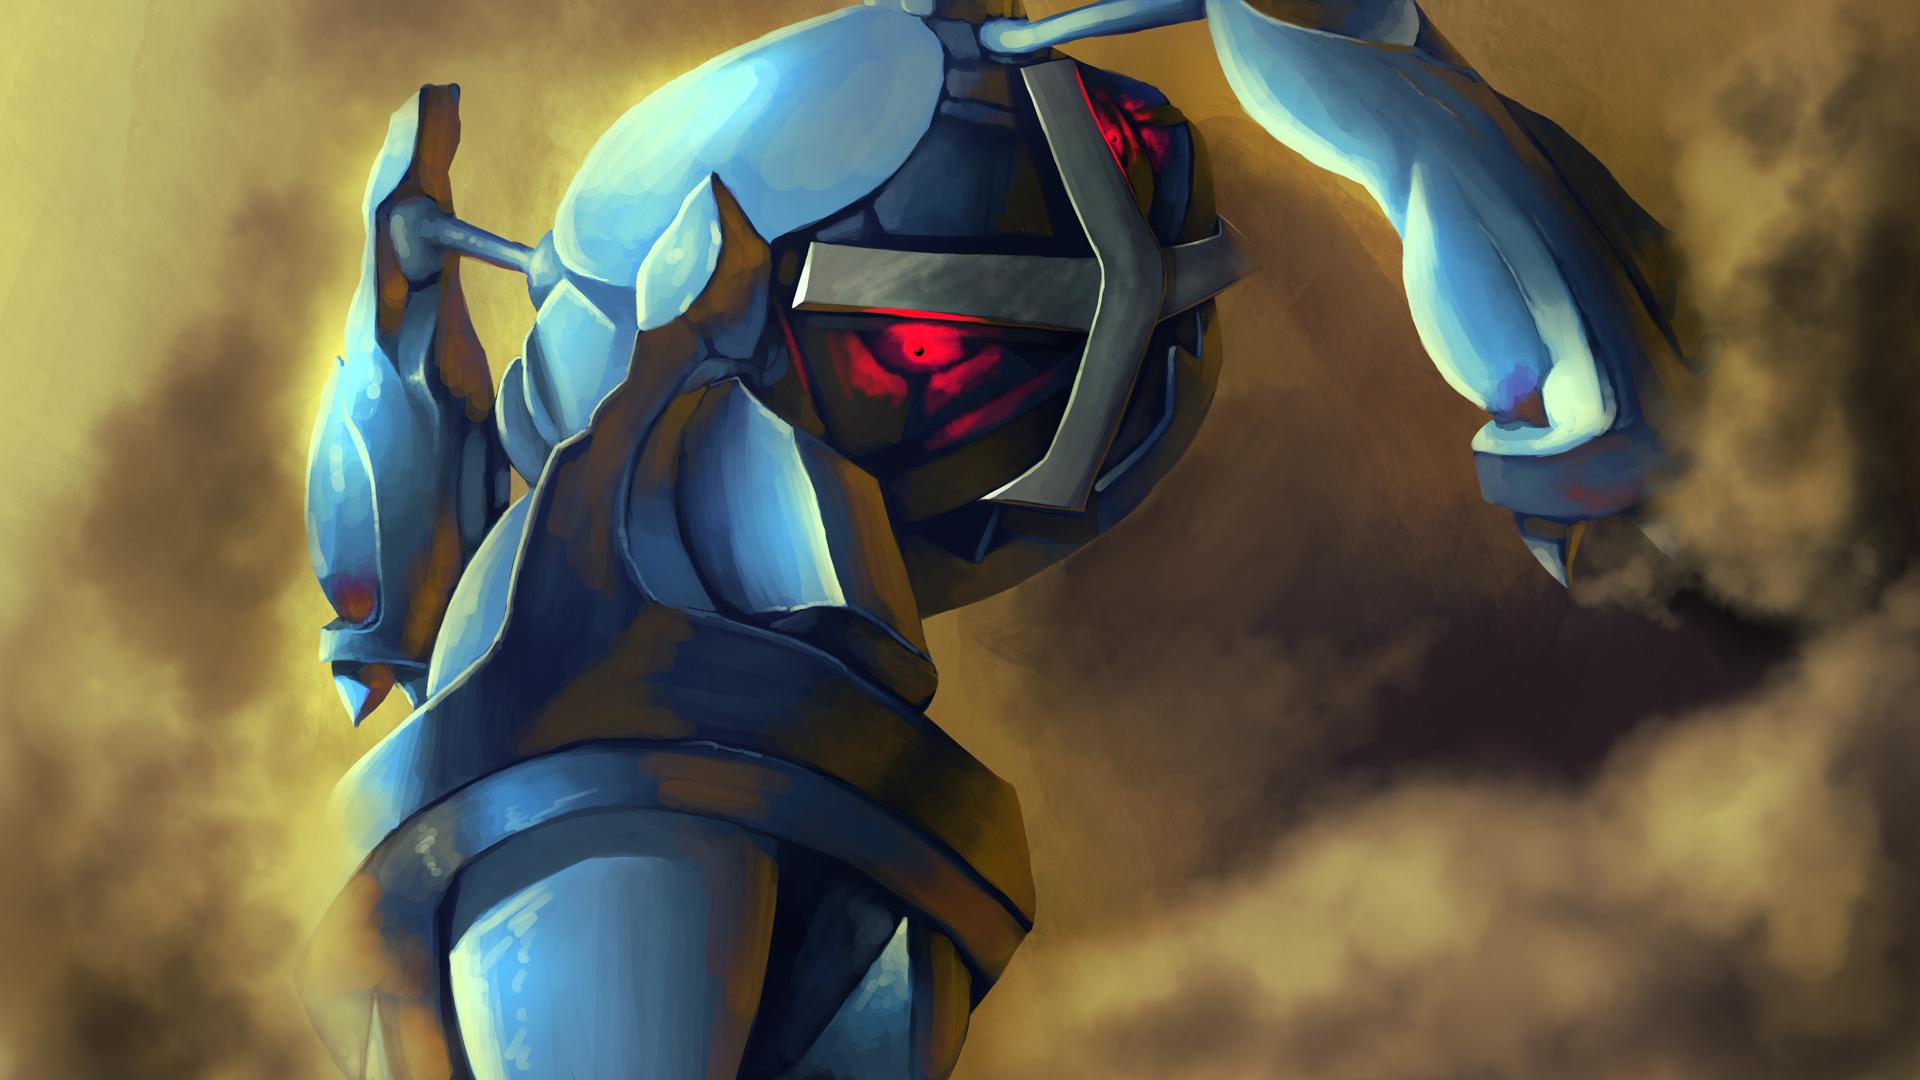 Pokemon Mega Metagross Card Metagross Speed Painting By Aetaluta Dyxlu